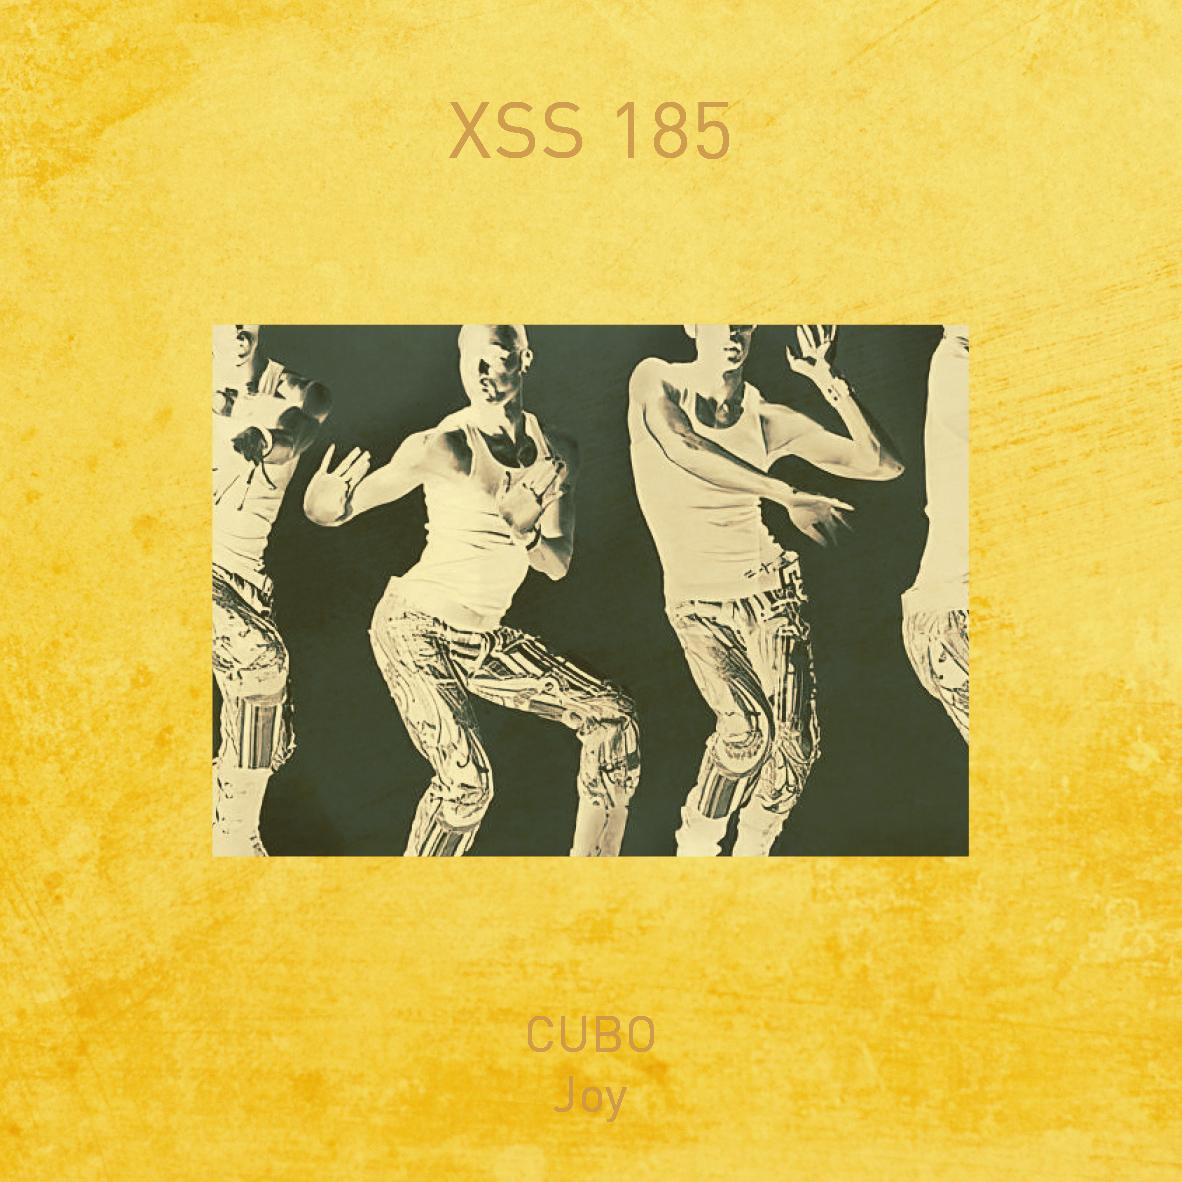 XSS185 | Cubo | Joy